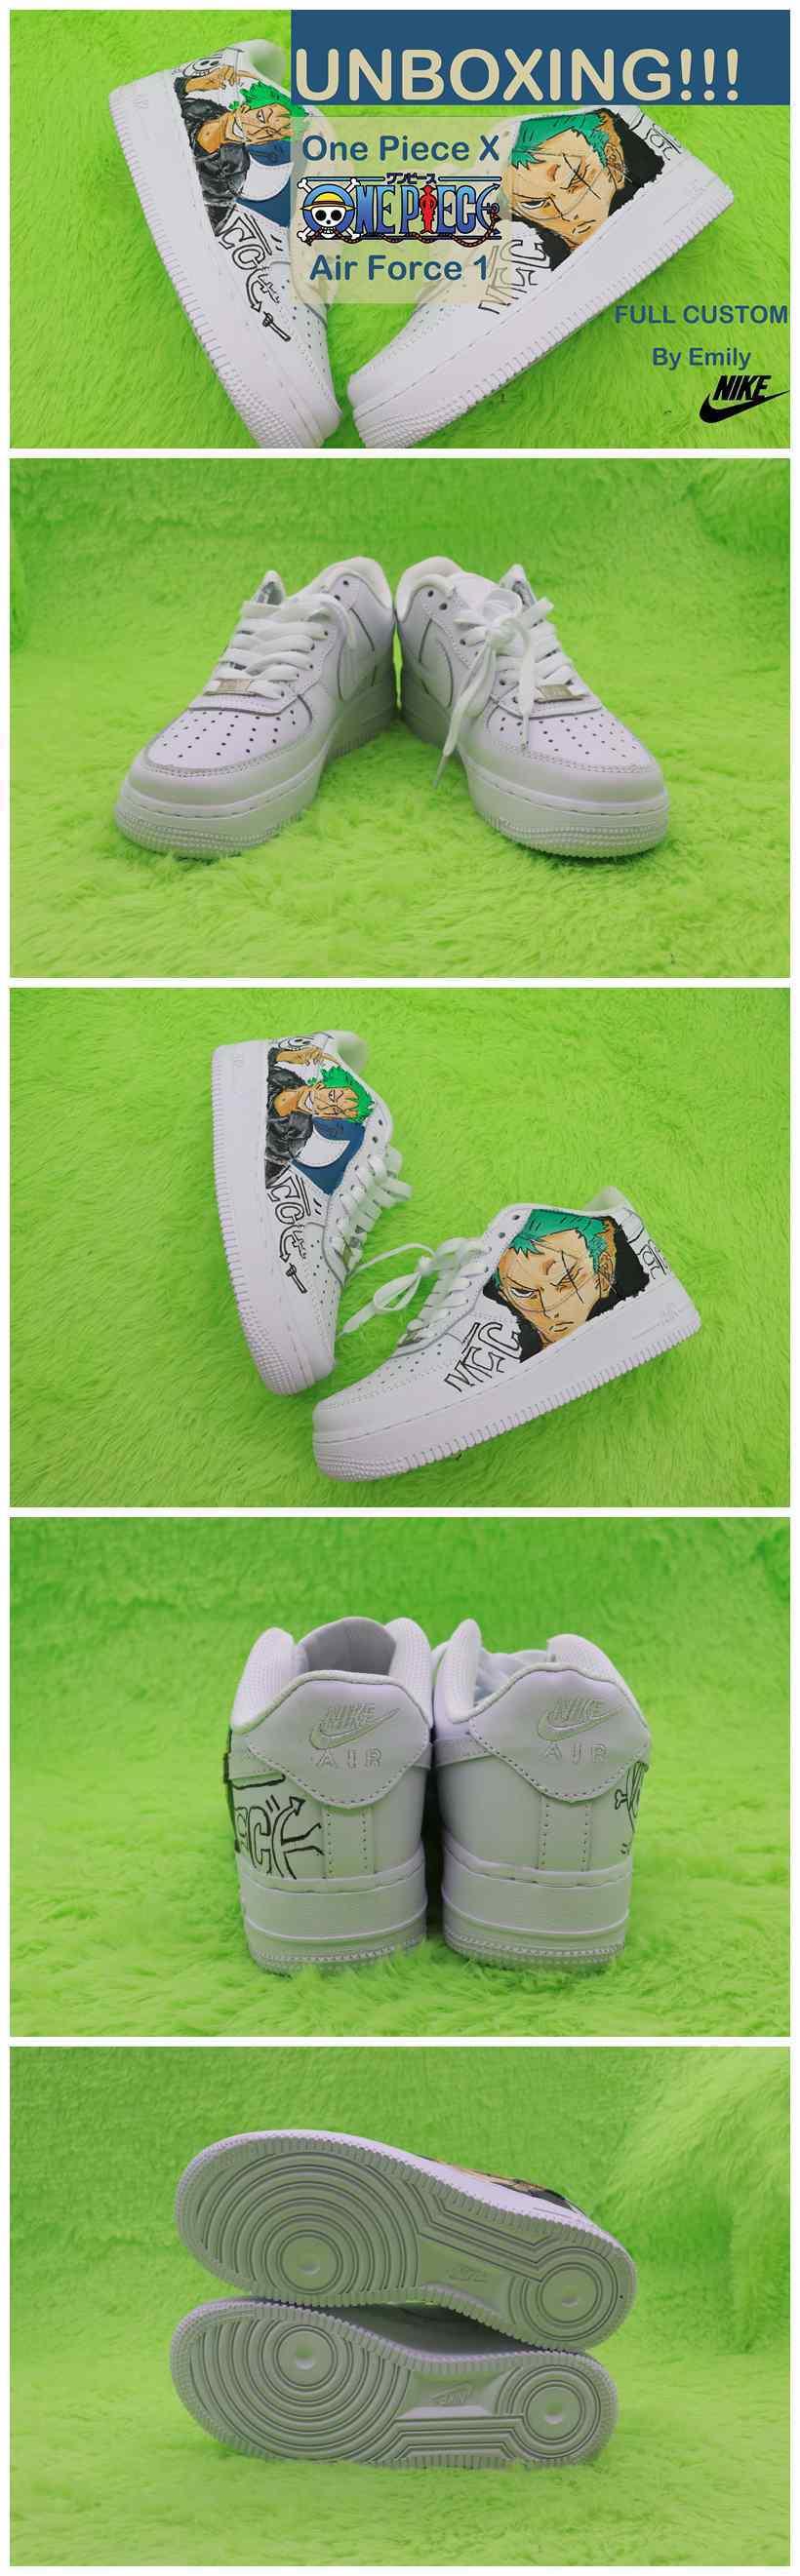 One Piece Custom Shoes